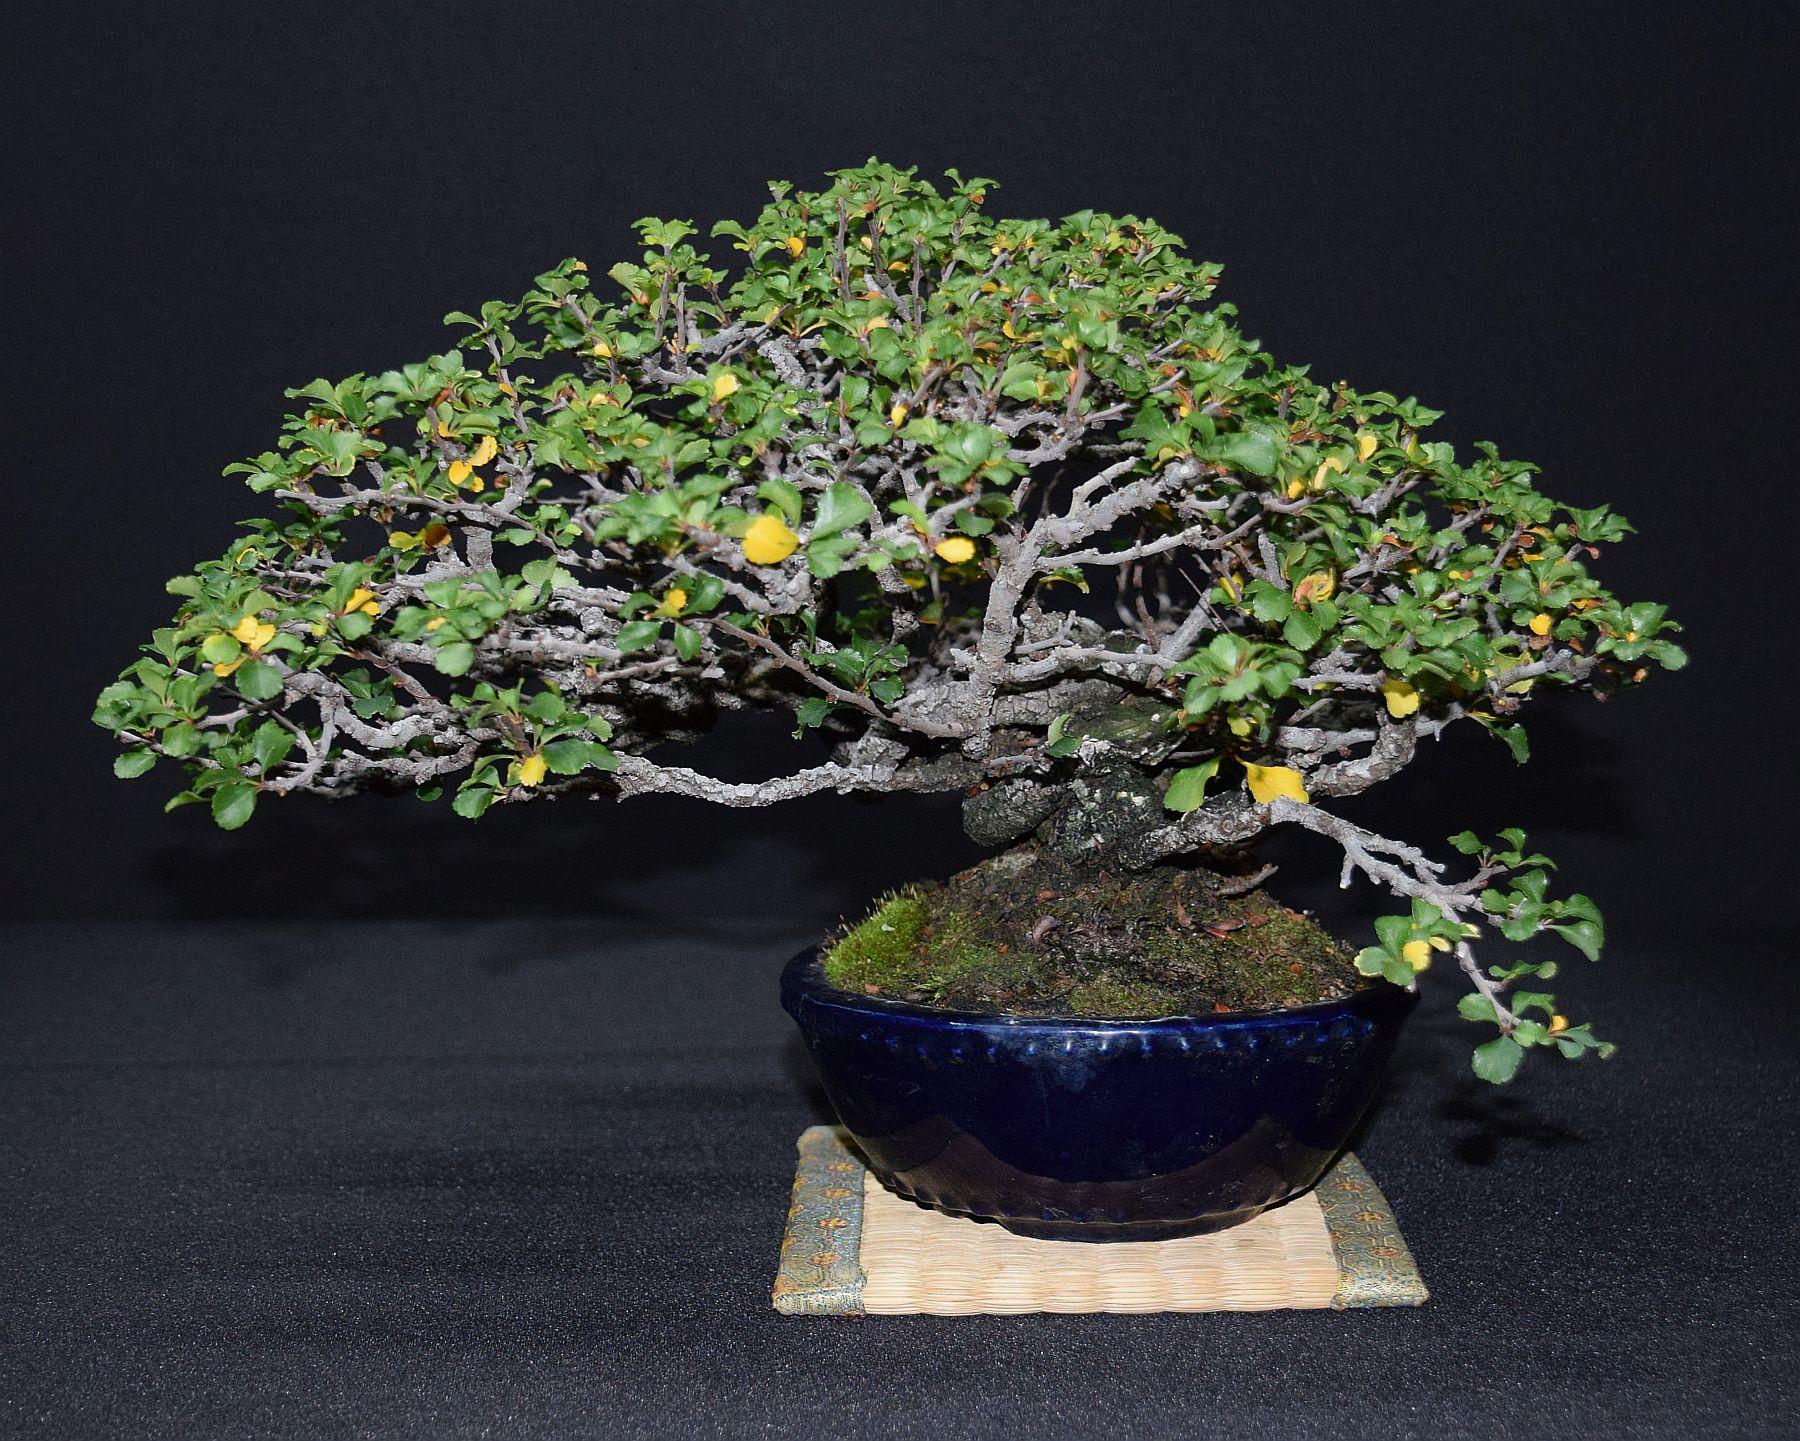 bonsai-museum-luis-vallejo-038